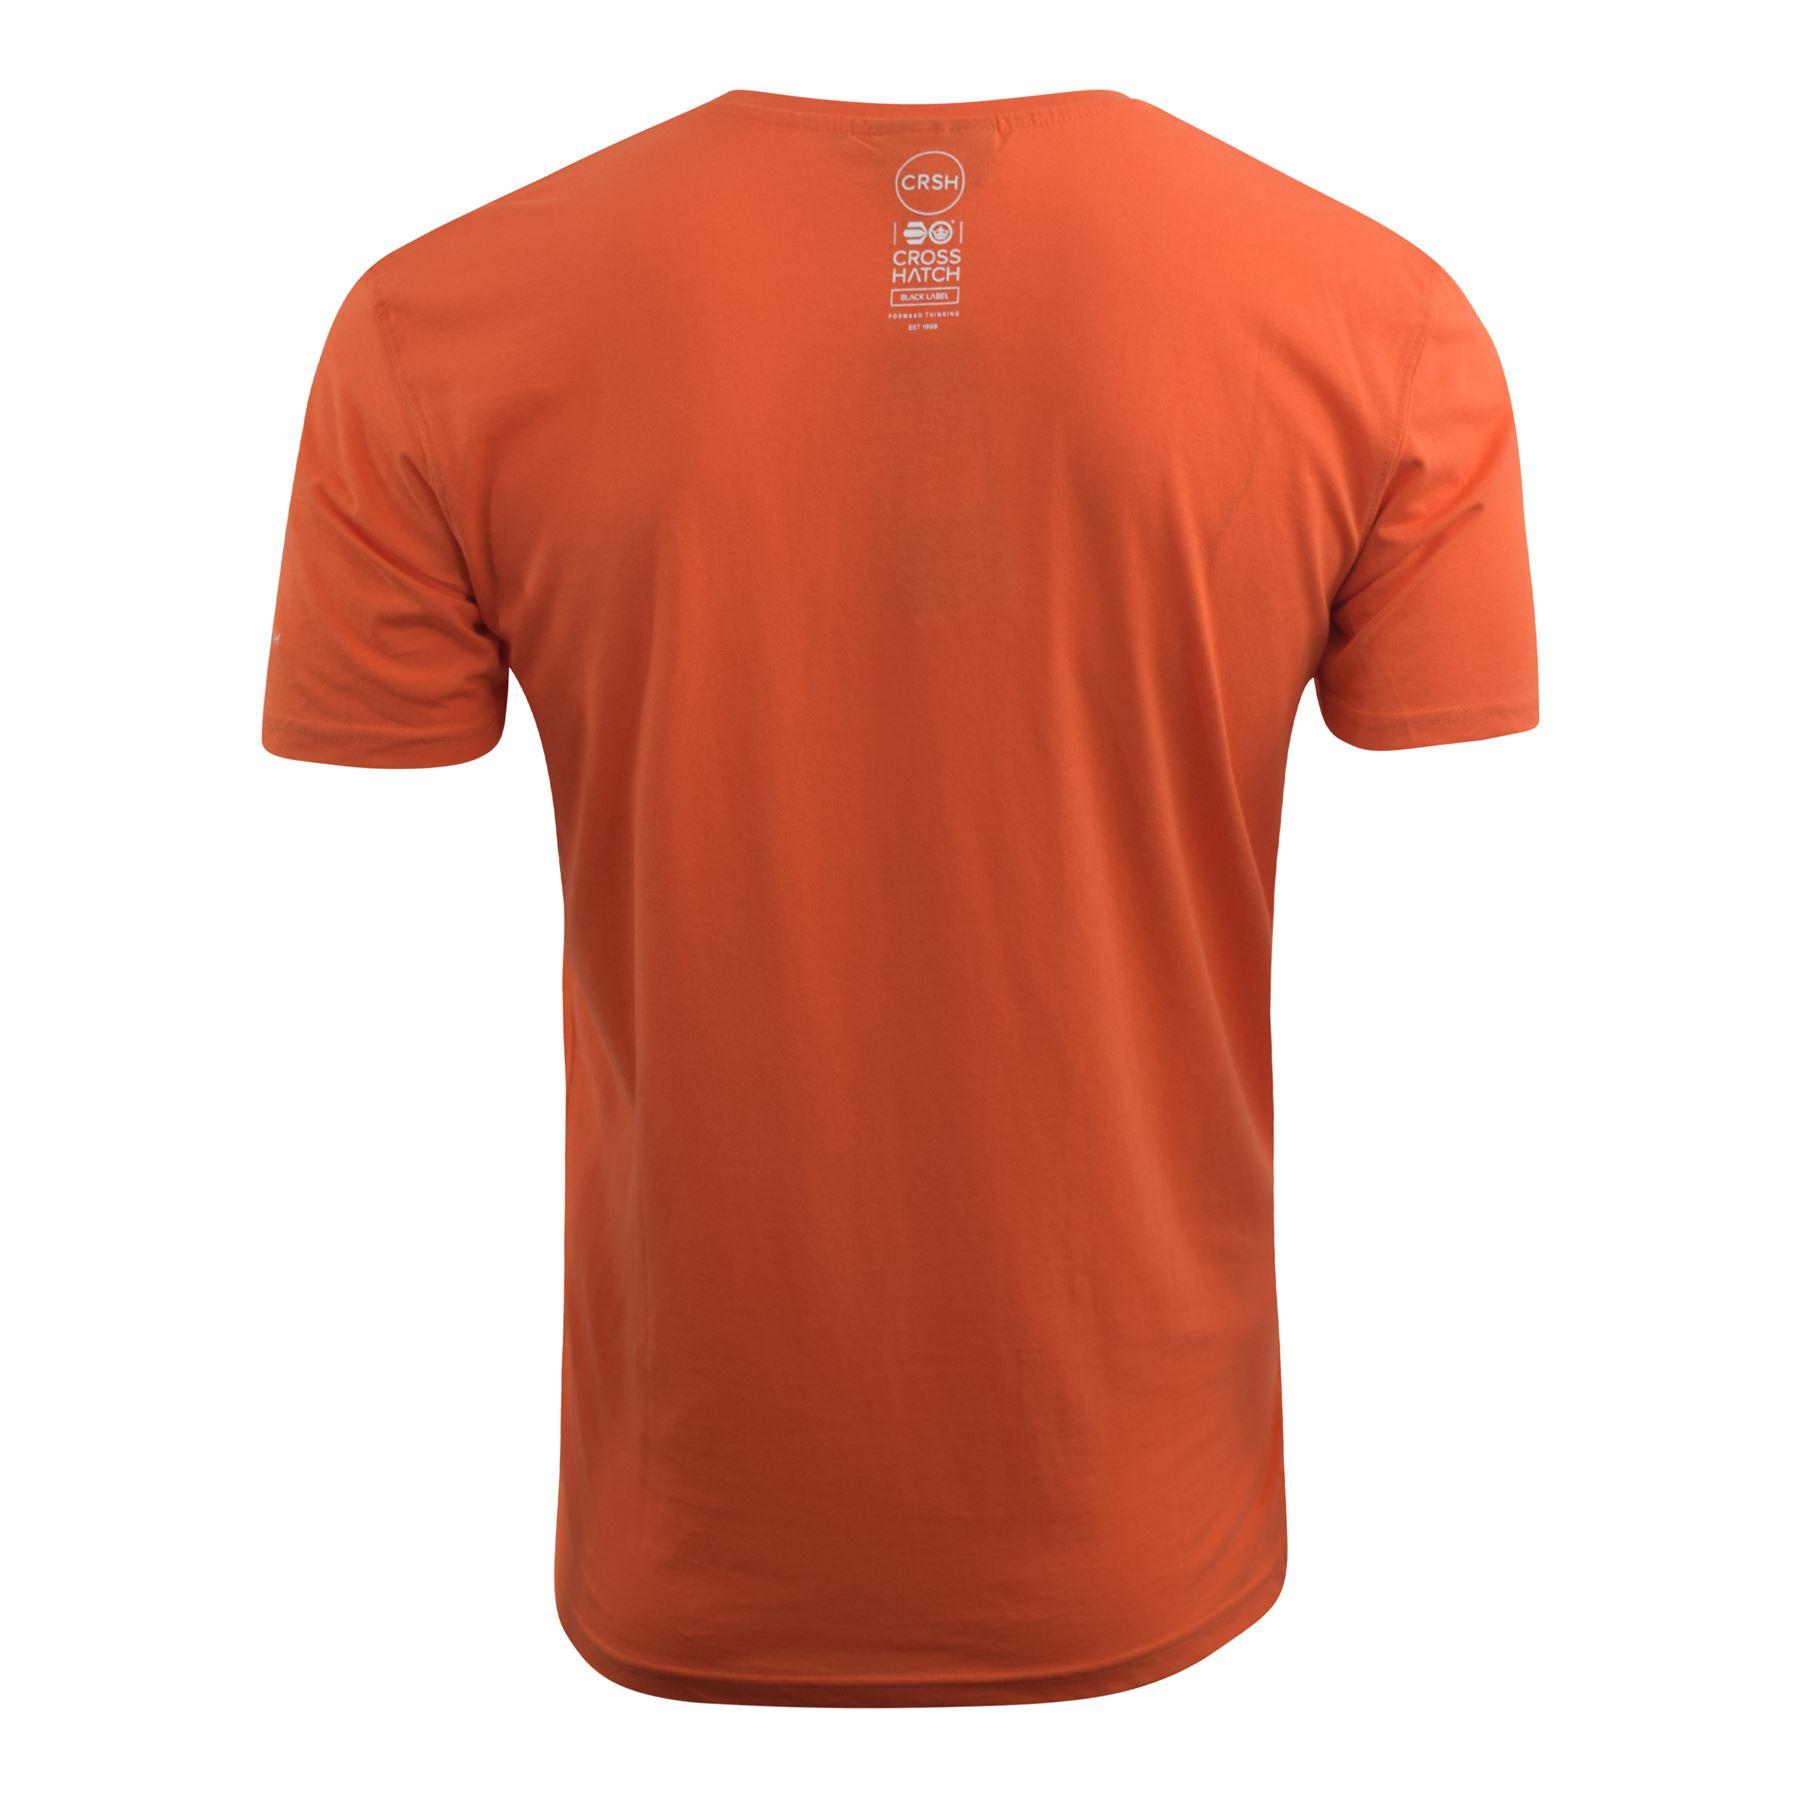 Mens-Crosshatch-T-shirt-Contrast-Graphic-Print-Top-Tee-Westfan thumbnail 7